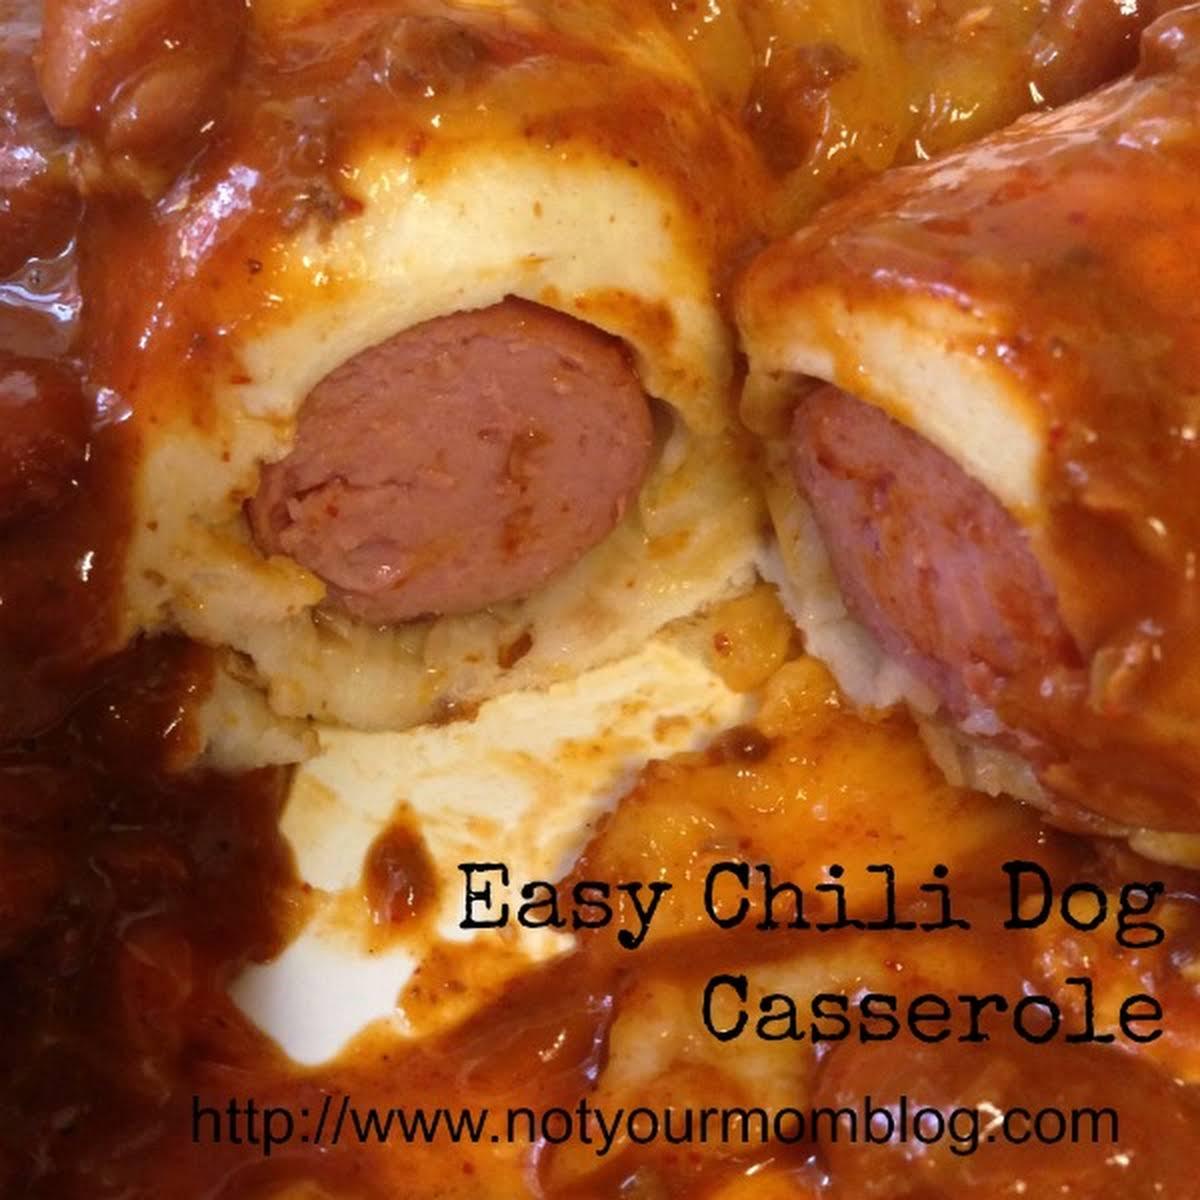 Easy Chili Dog Casserole